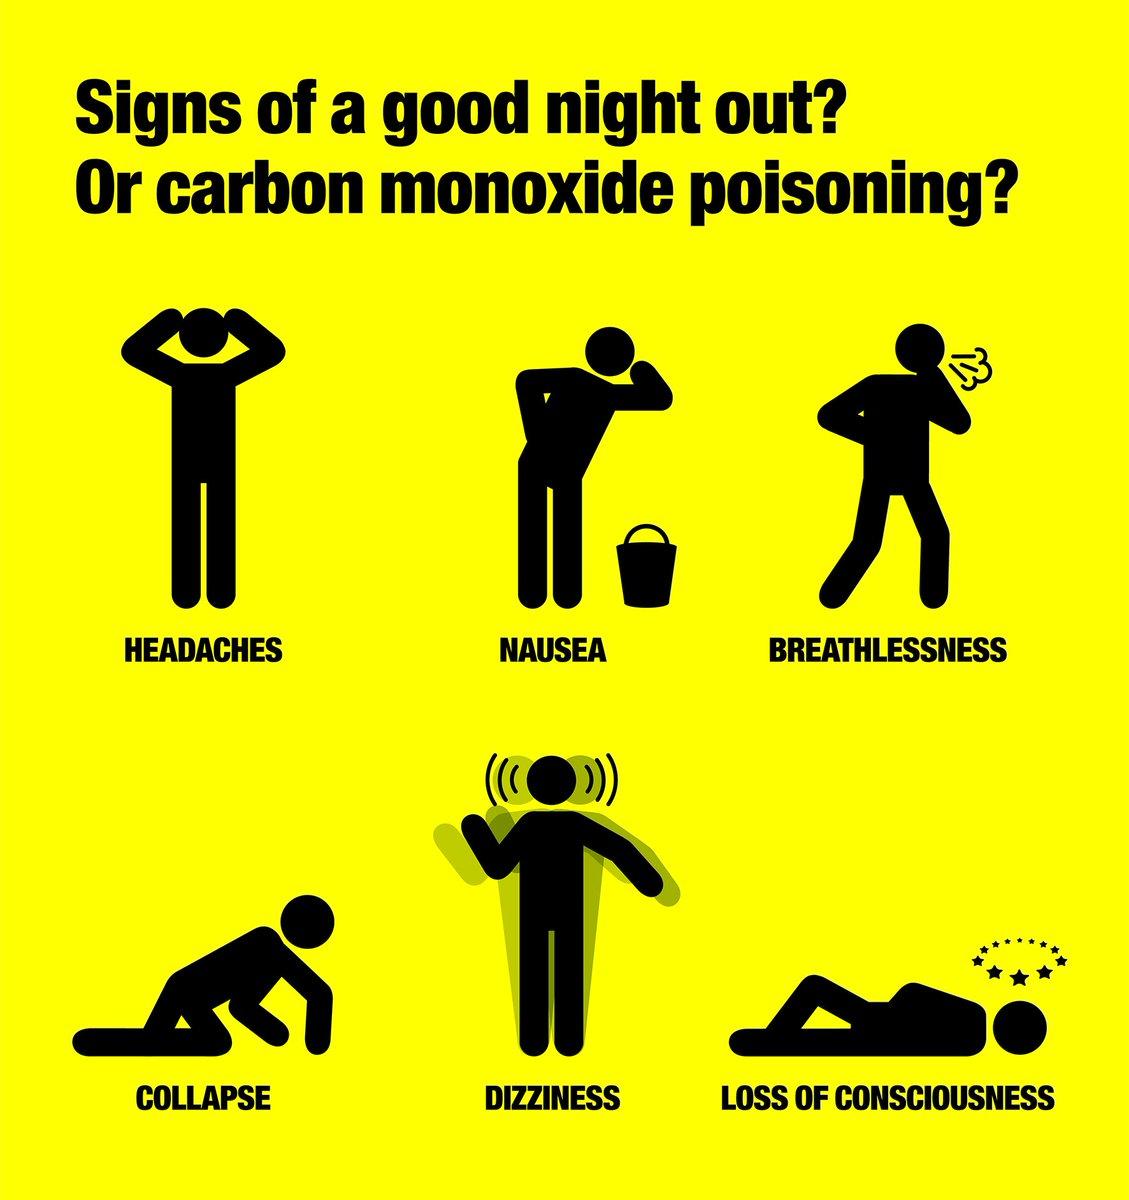 Carbon monoxide poisoning symptoms in adults